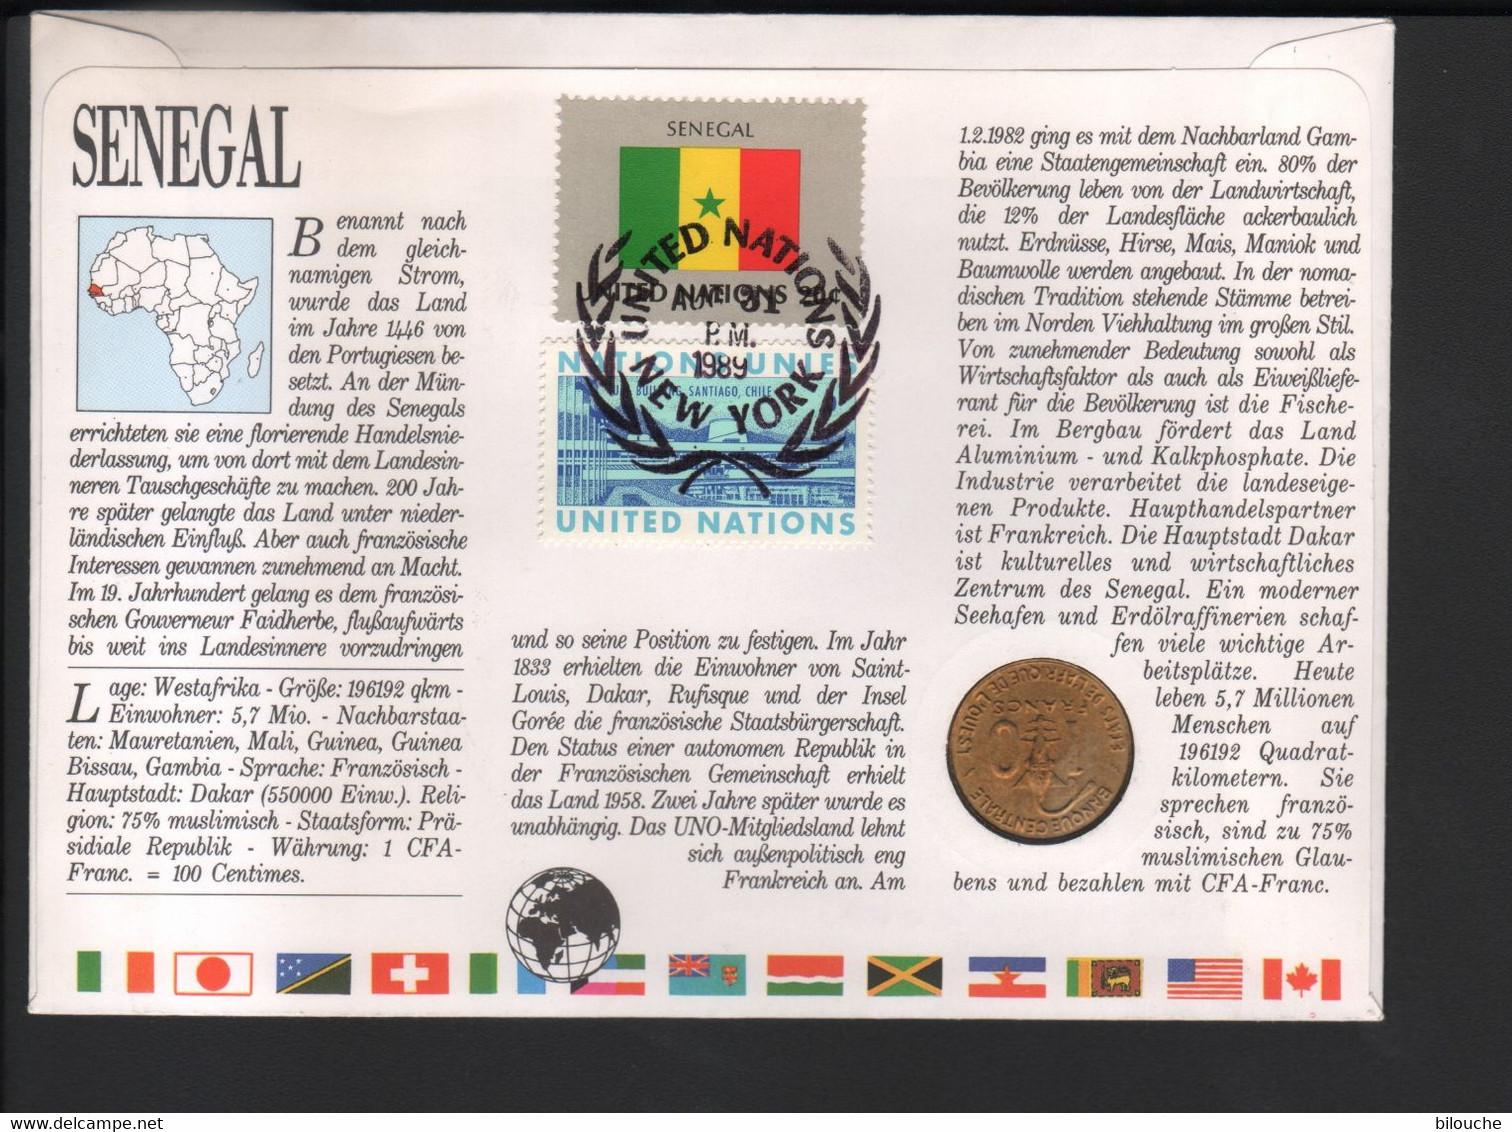 BUZIN / FDC AVEC PIECE COMMEMORATIVE / O.N.U. / SENEGAL 1988 / DAMA GAZELLE - 1985-.. Vogels (Buzin)